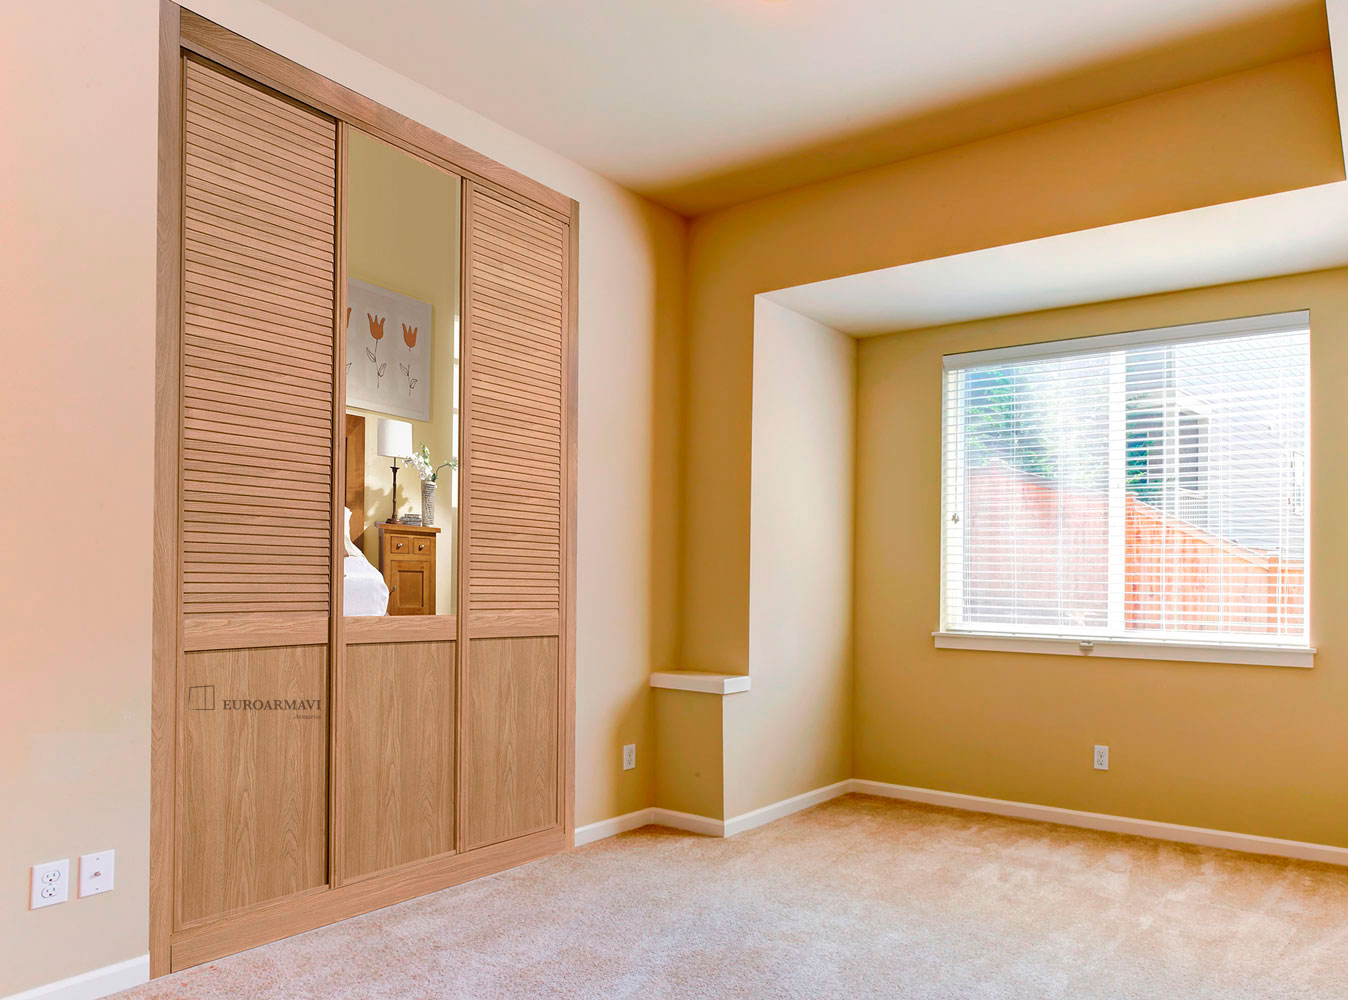 13-euroarmavi-armario-con-espejo-dormitorio-mod-mabel